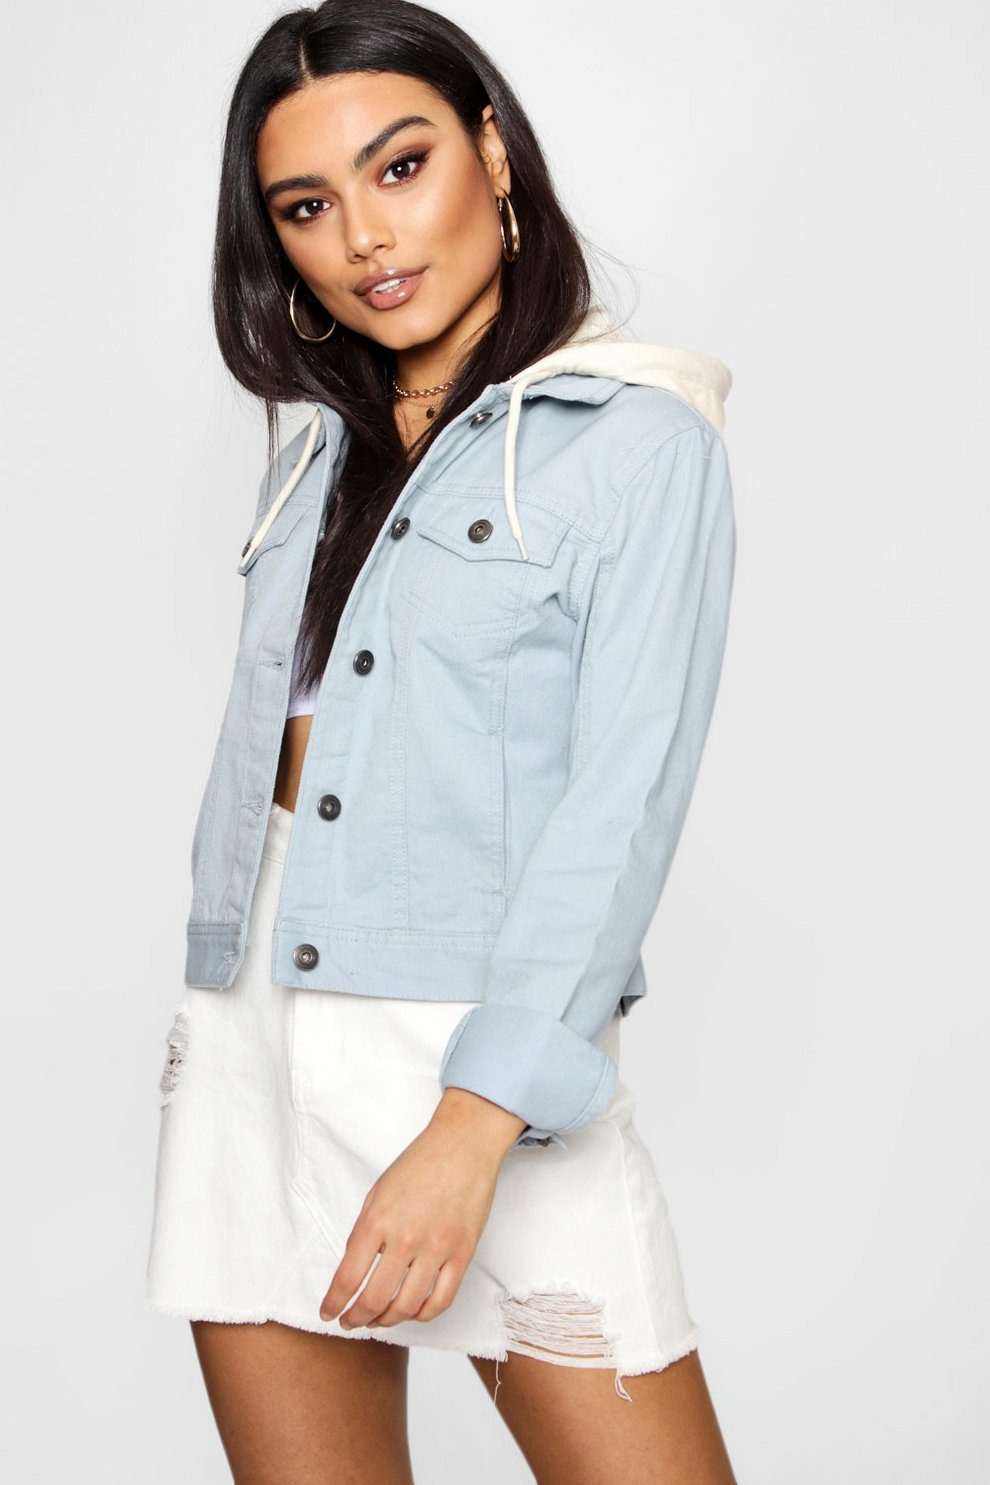 Boohoo Hooded Pastel Twill Jacket Reliable Sale Online JYIjzB